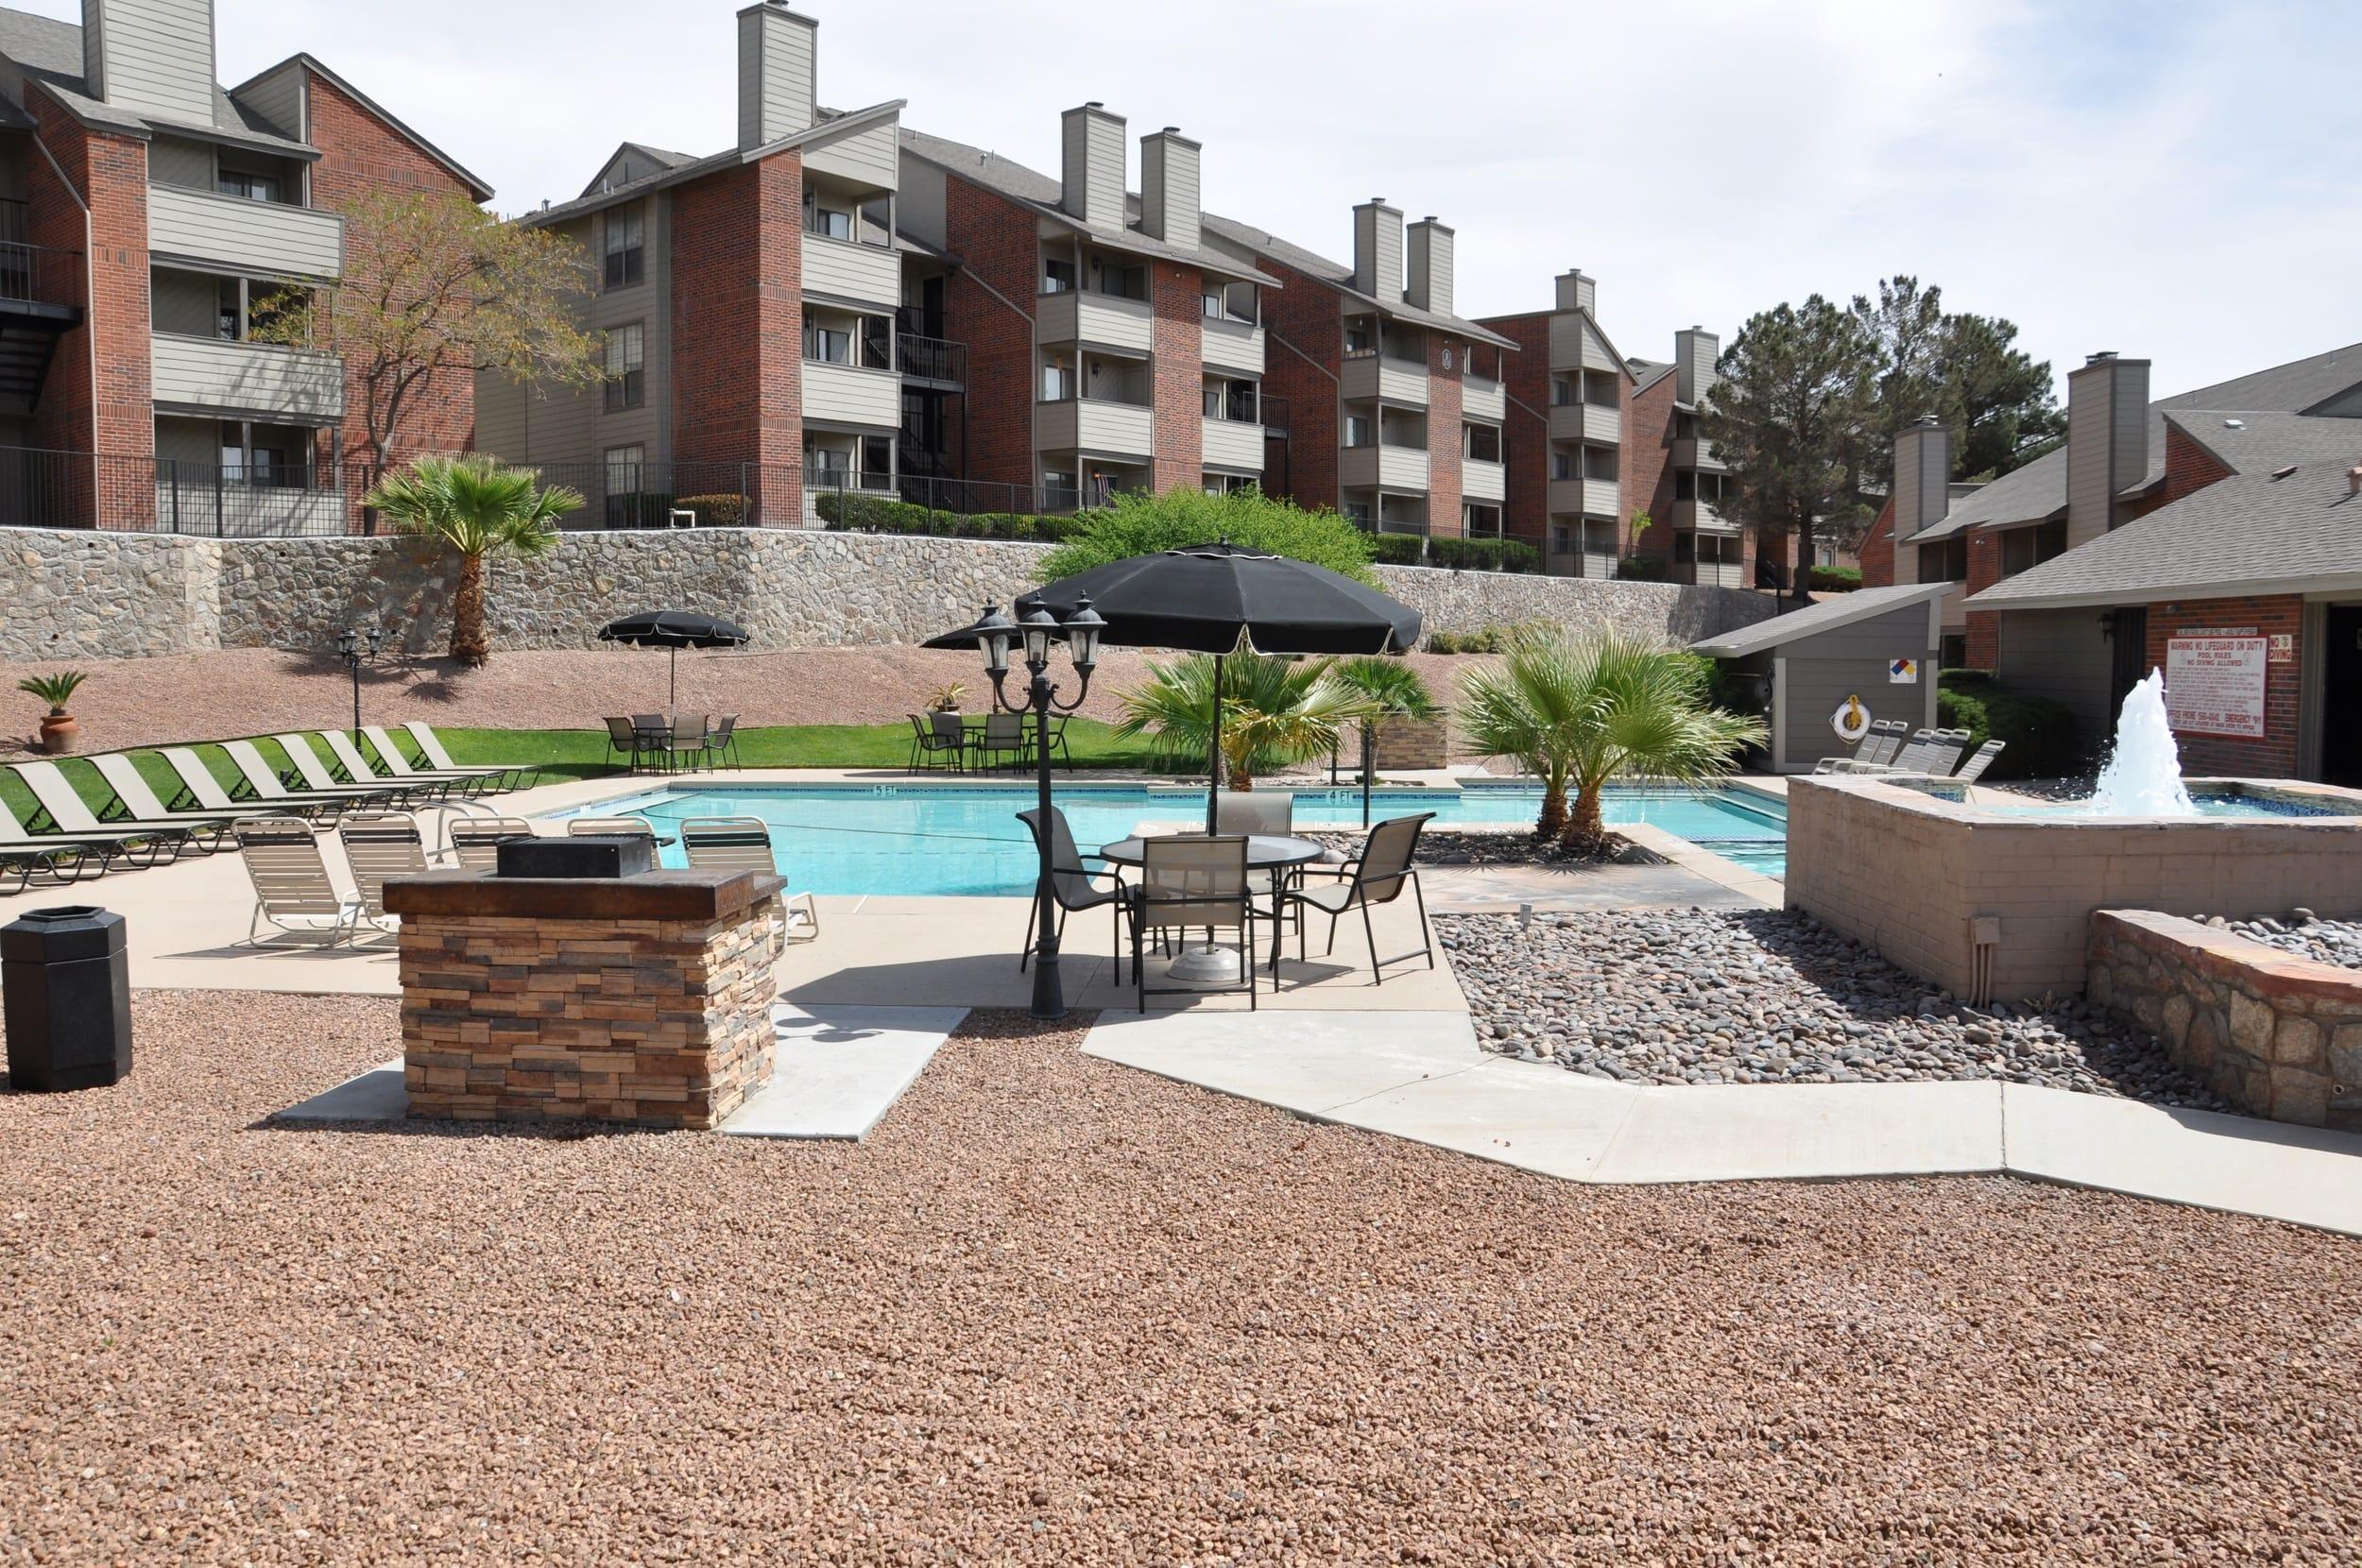 Swimming pool view at apartments in El Paso